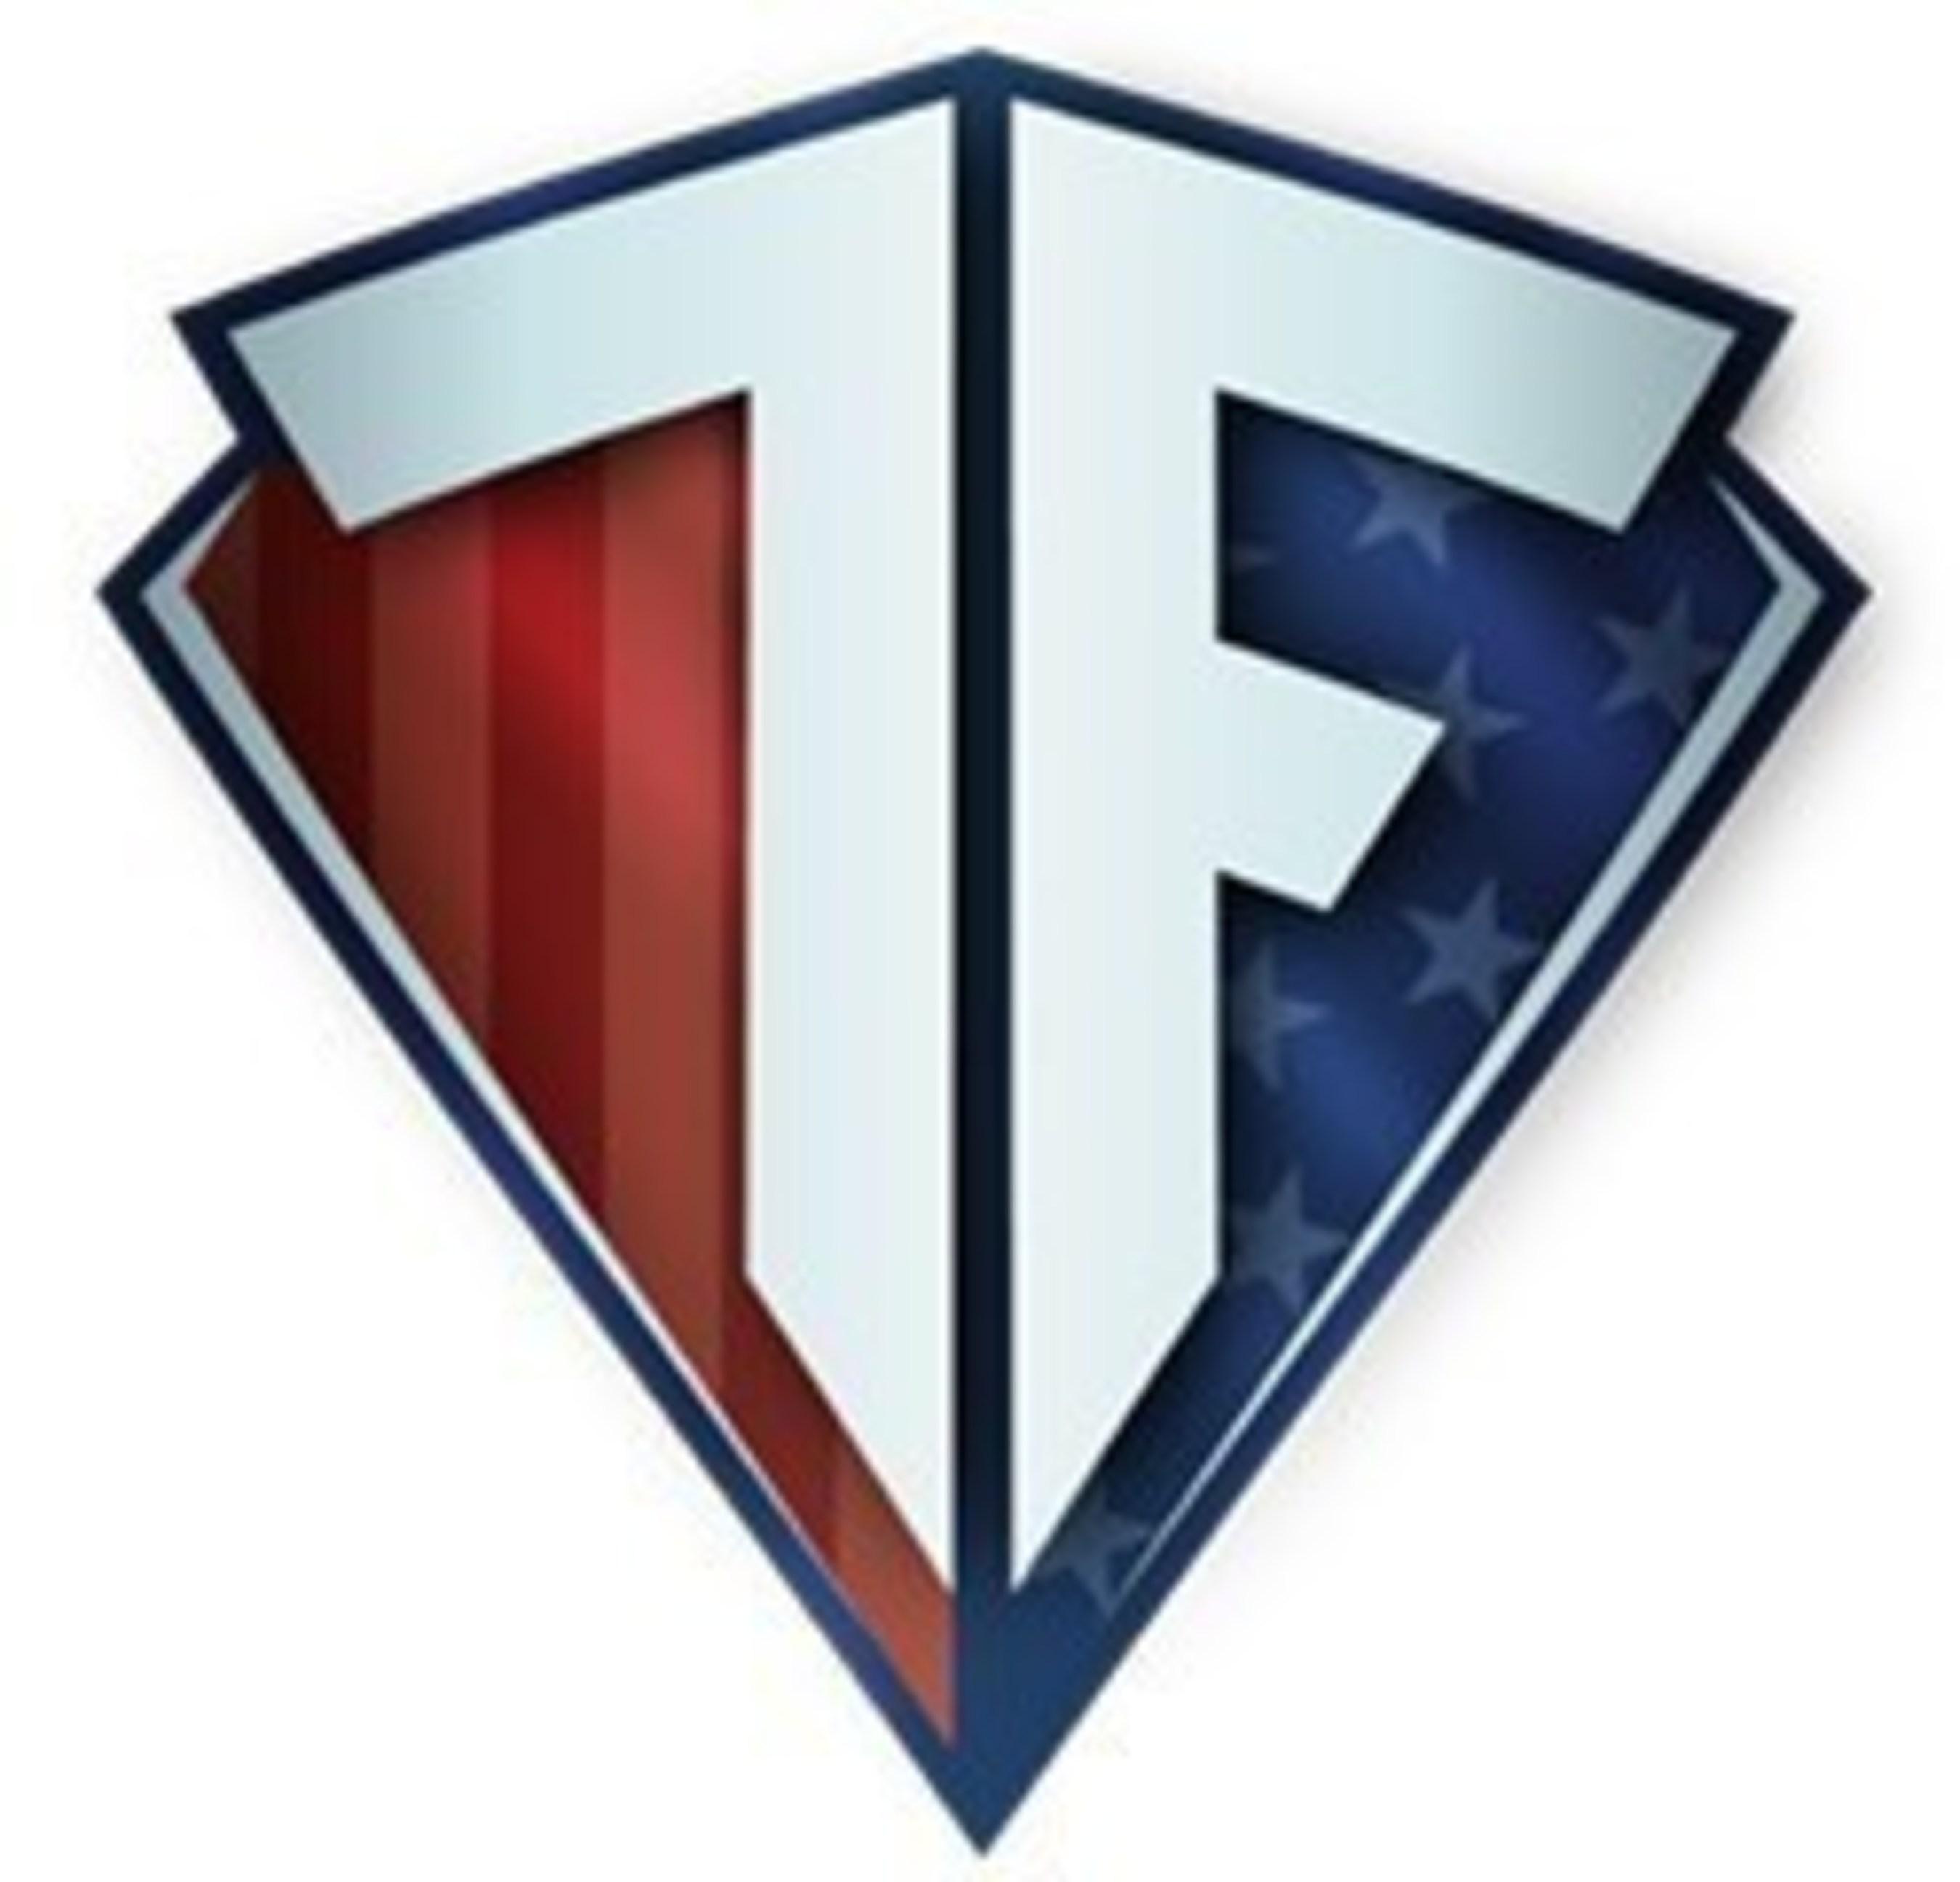 Introducing Team Freedom, Dota 2's Newest Pro Team